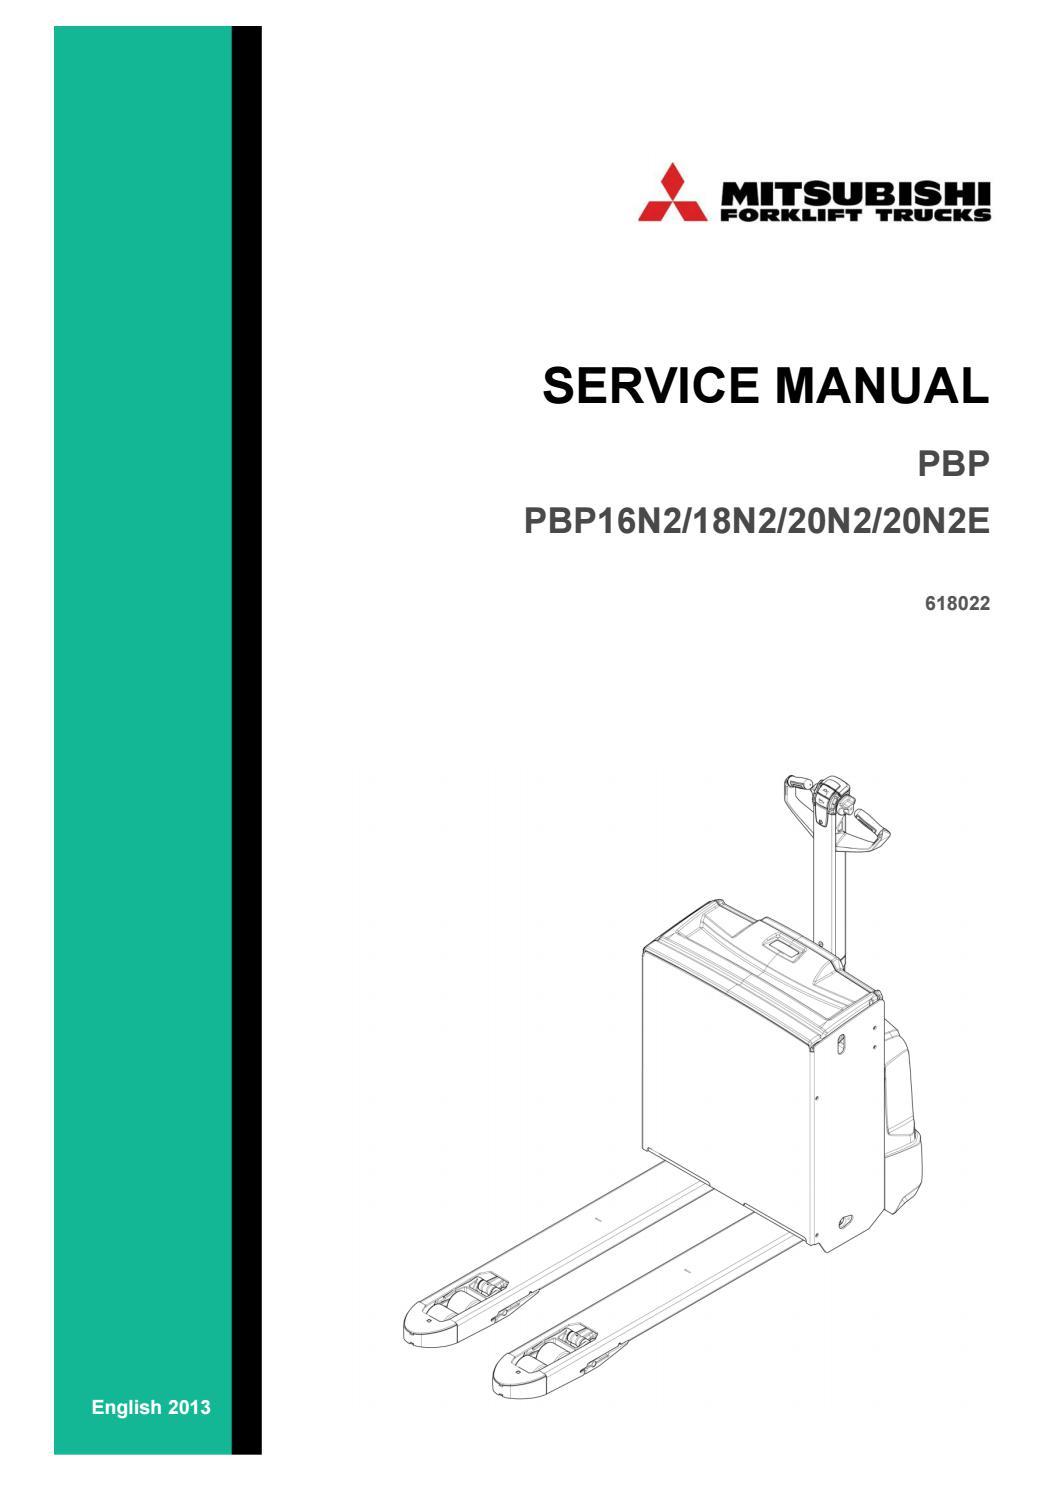 Mitsubishi Forklift PBP PBP16N2 18N2 20N2 20N2E Service Manual - PDF DOWNLOAD